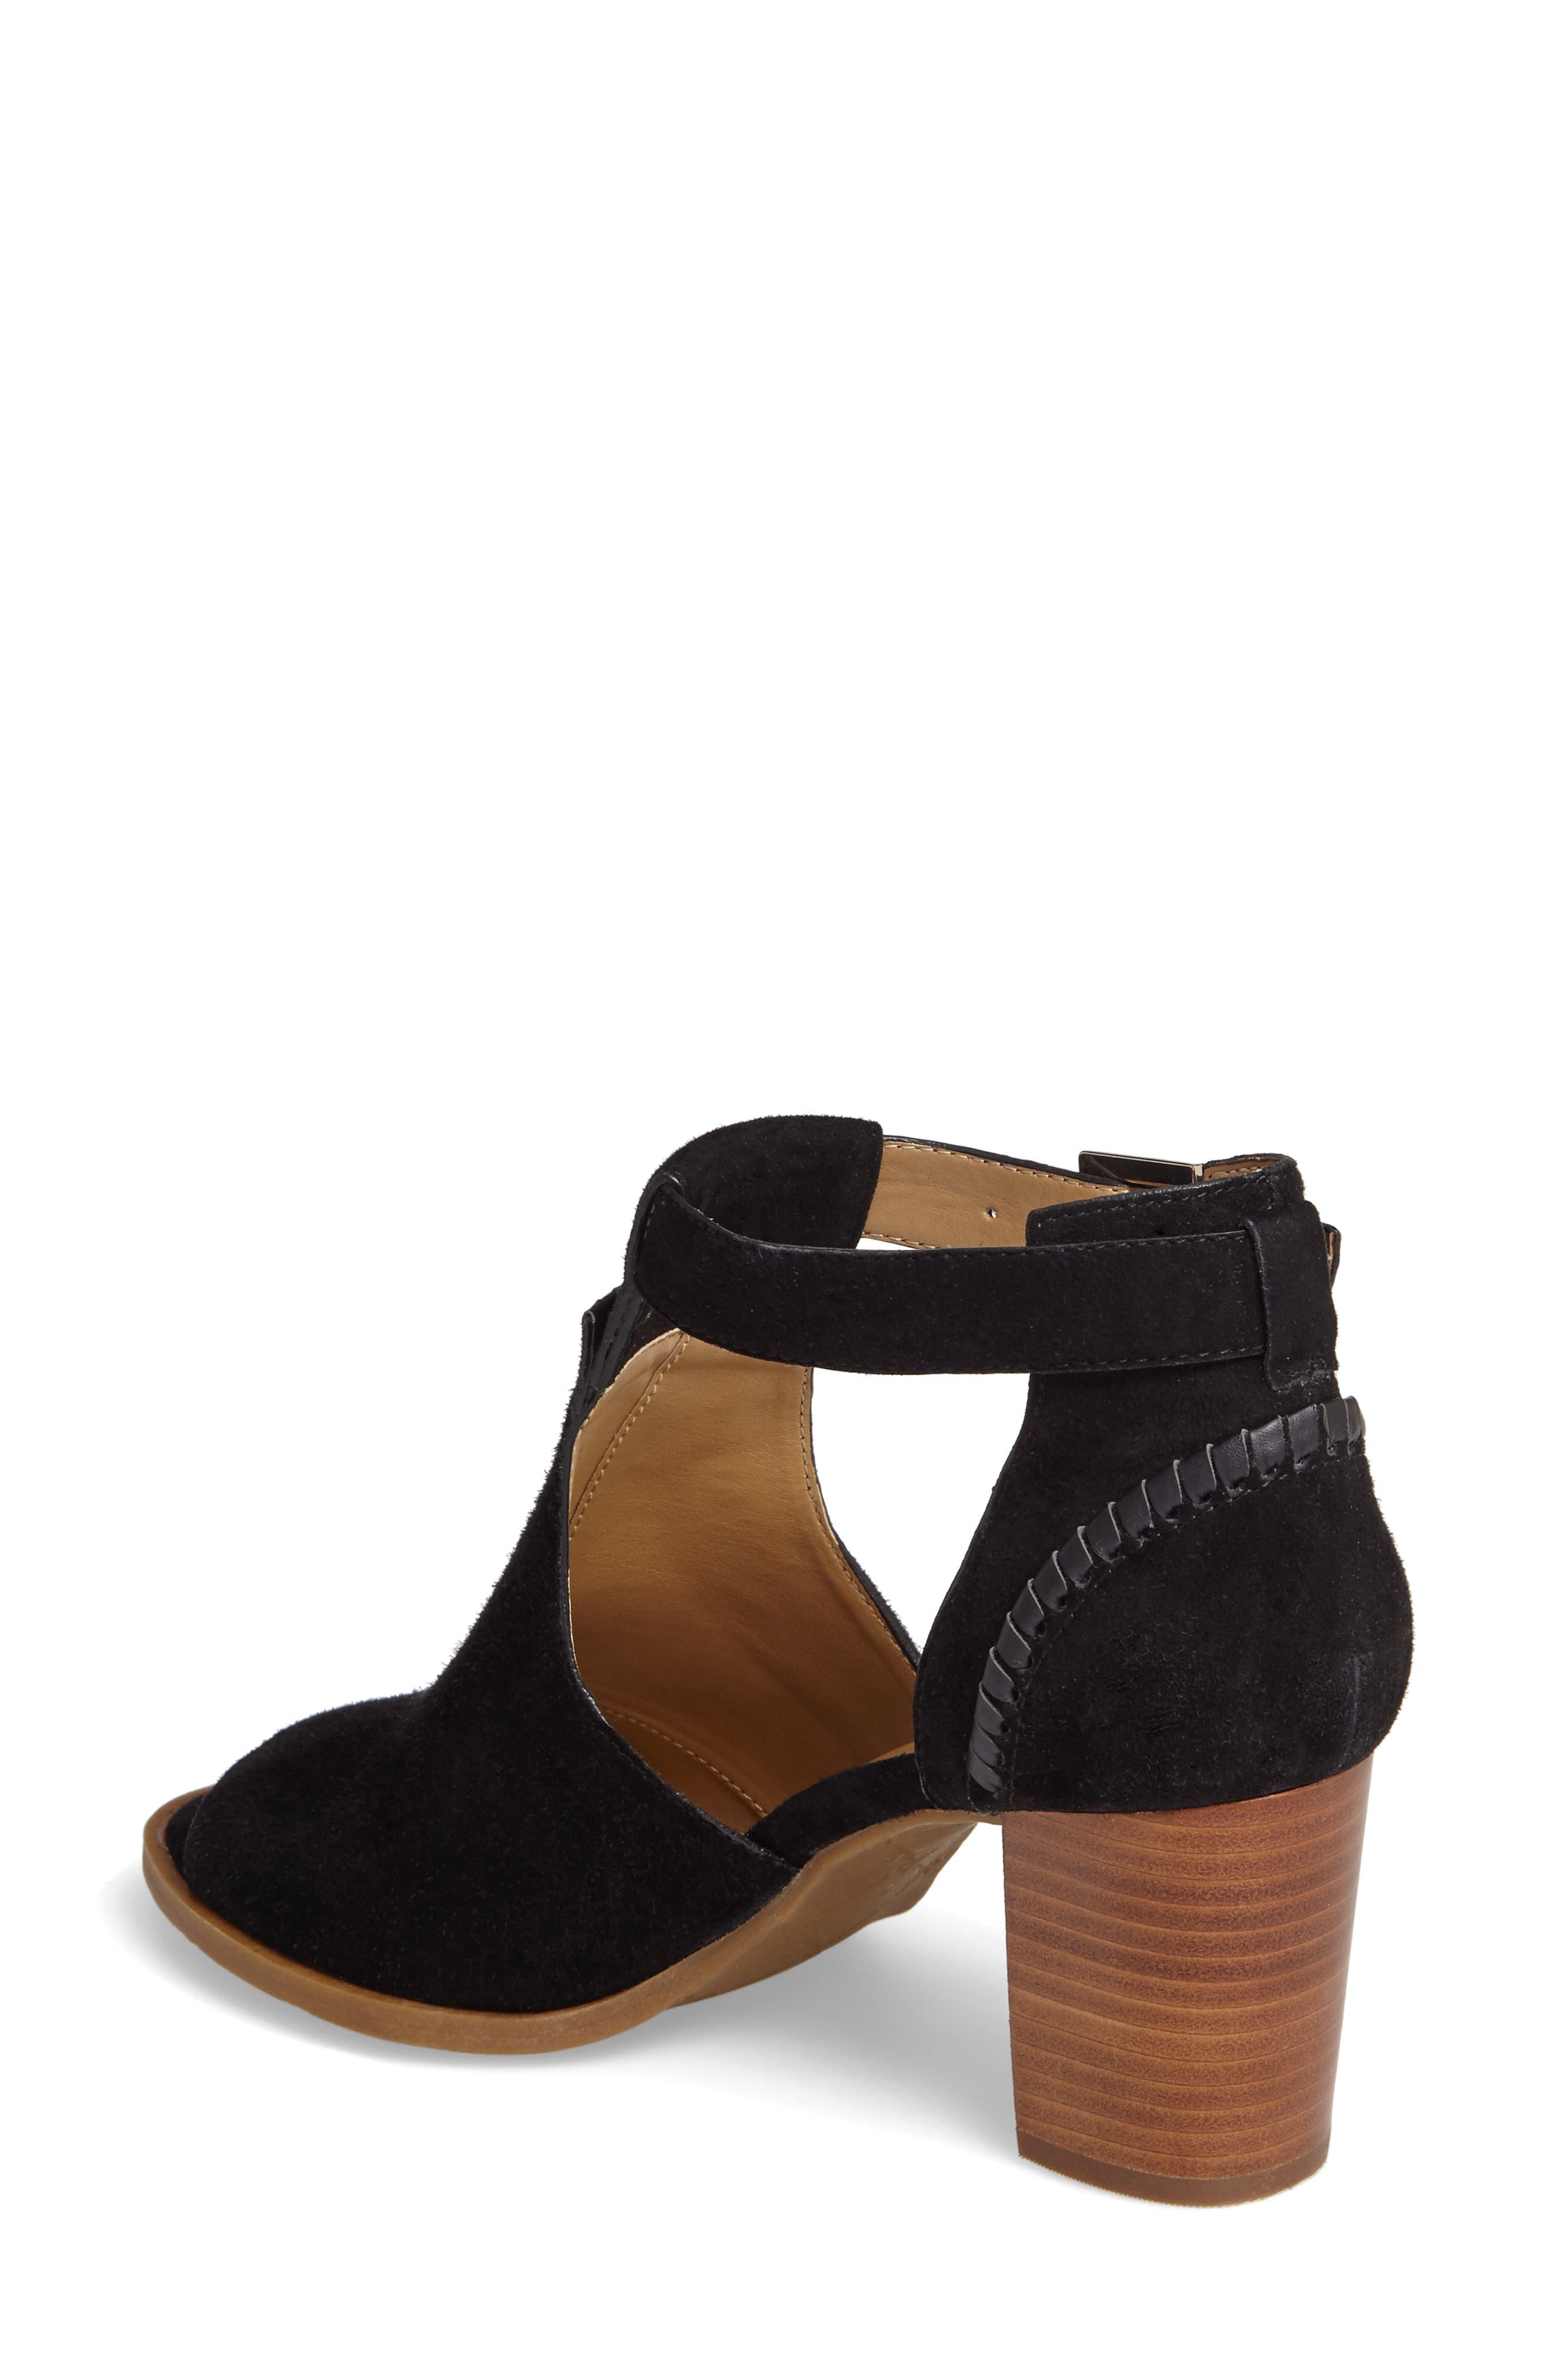 Cameron Block Heel Sandal,                             Alternate thumbnail 12, color,